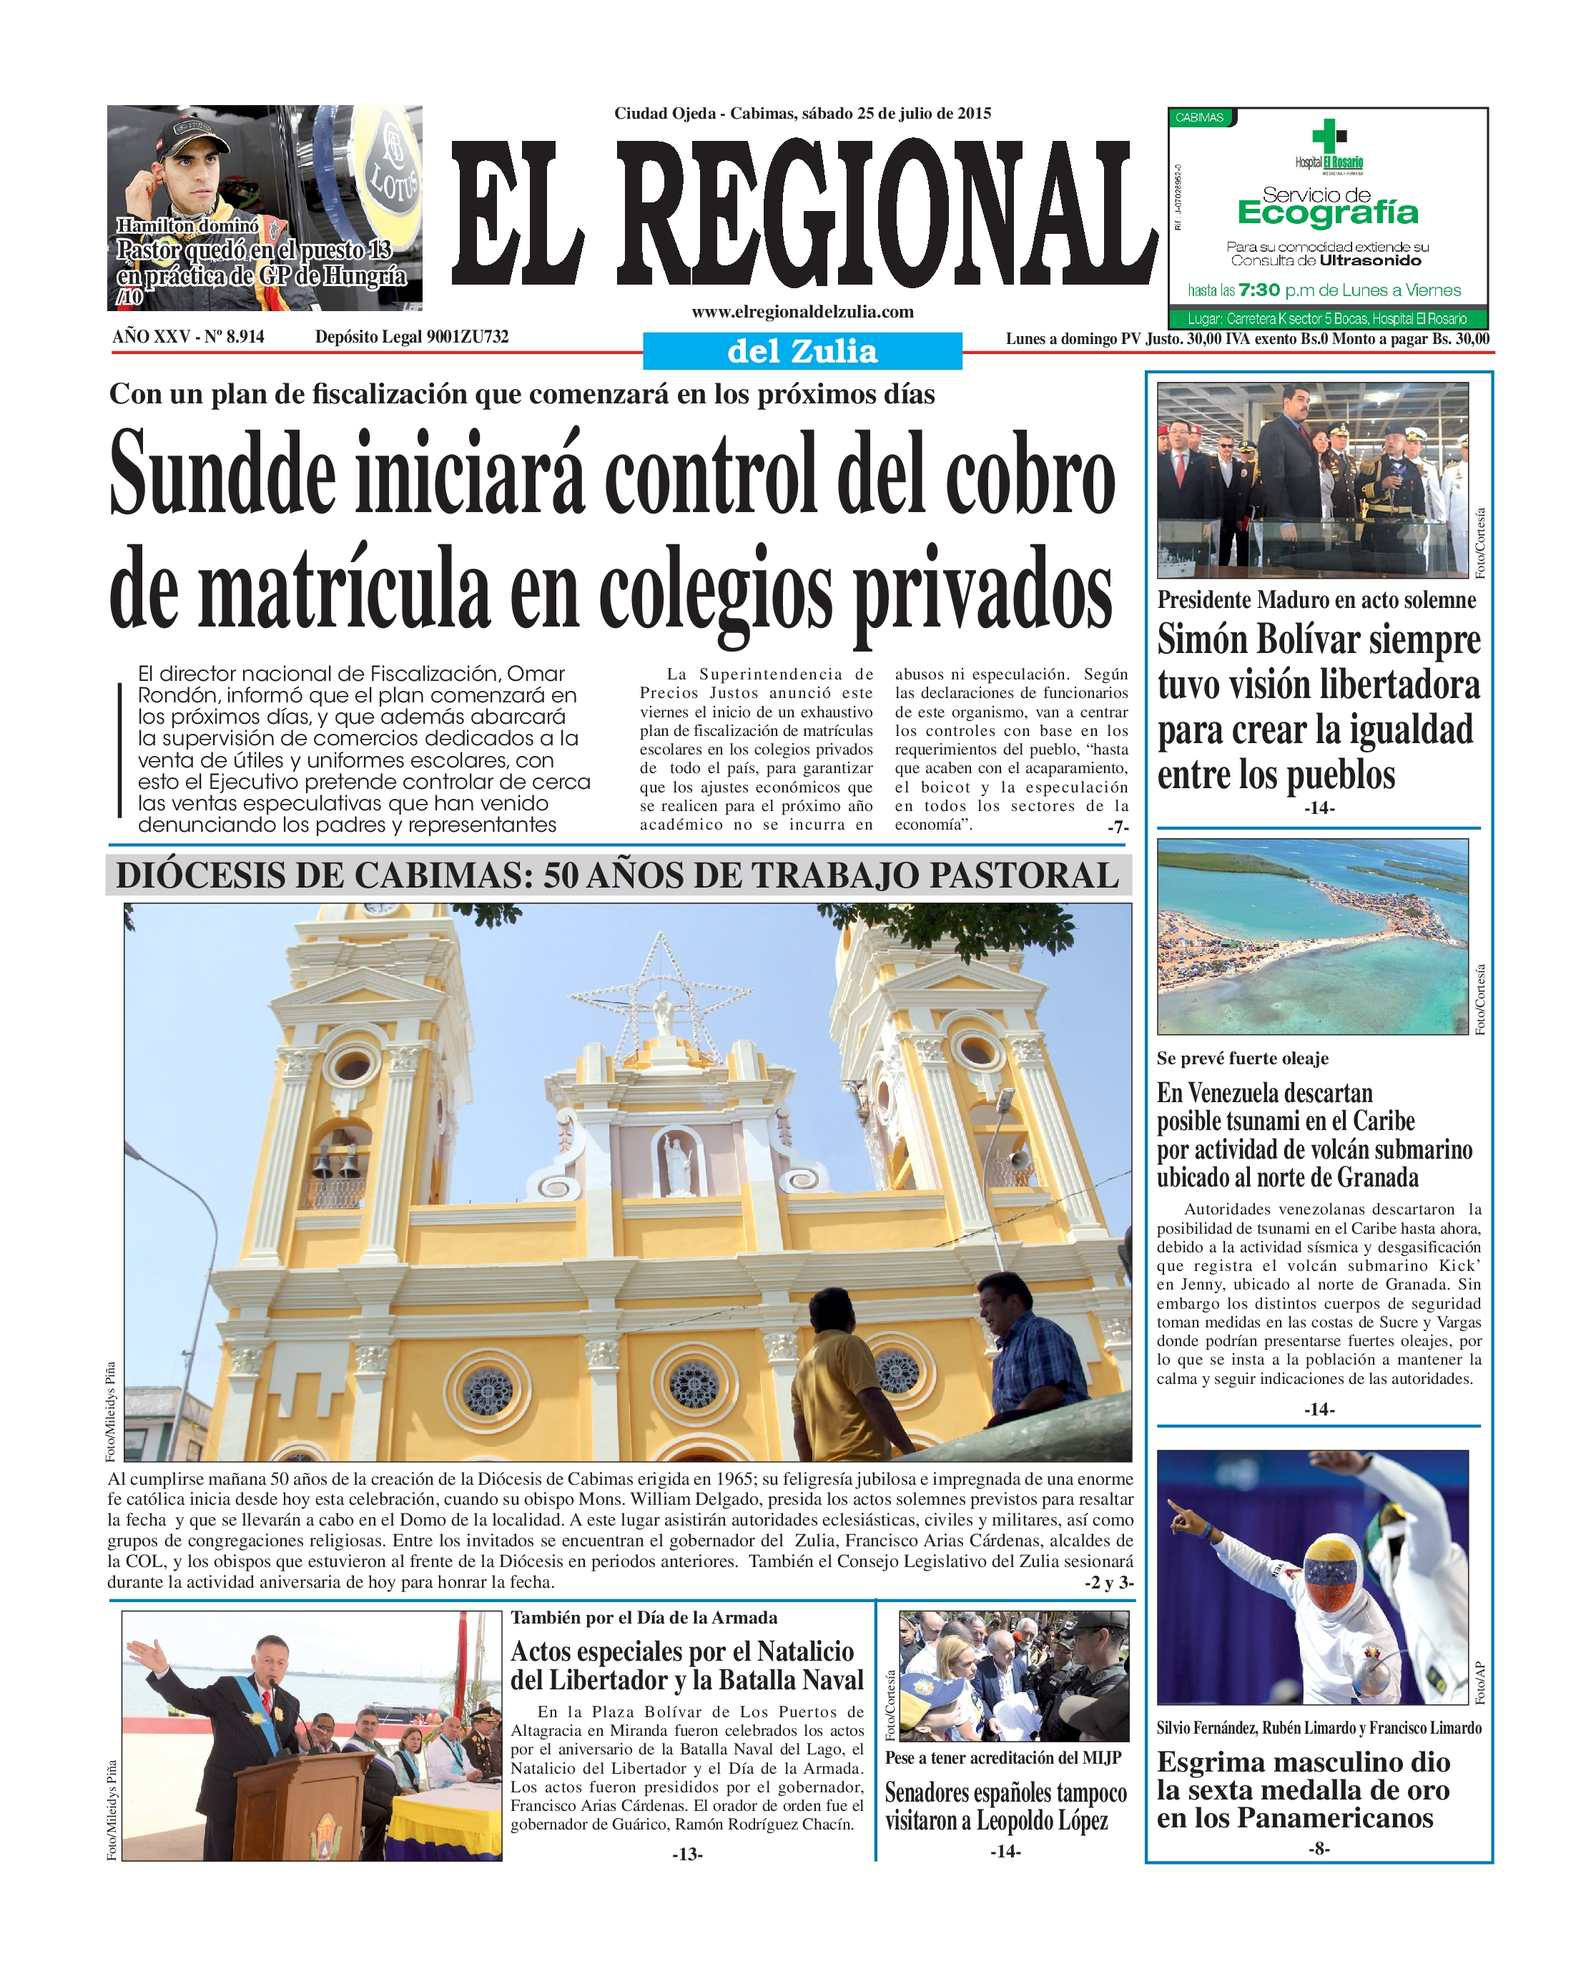 Calaméo - El Regional del Zulia 25-07-2015